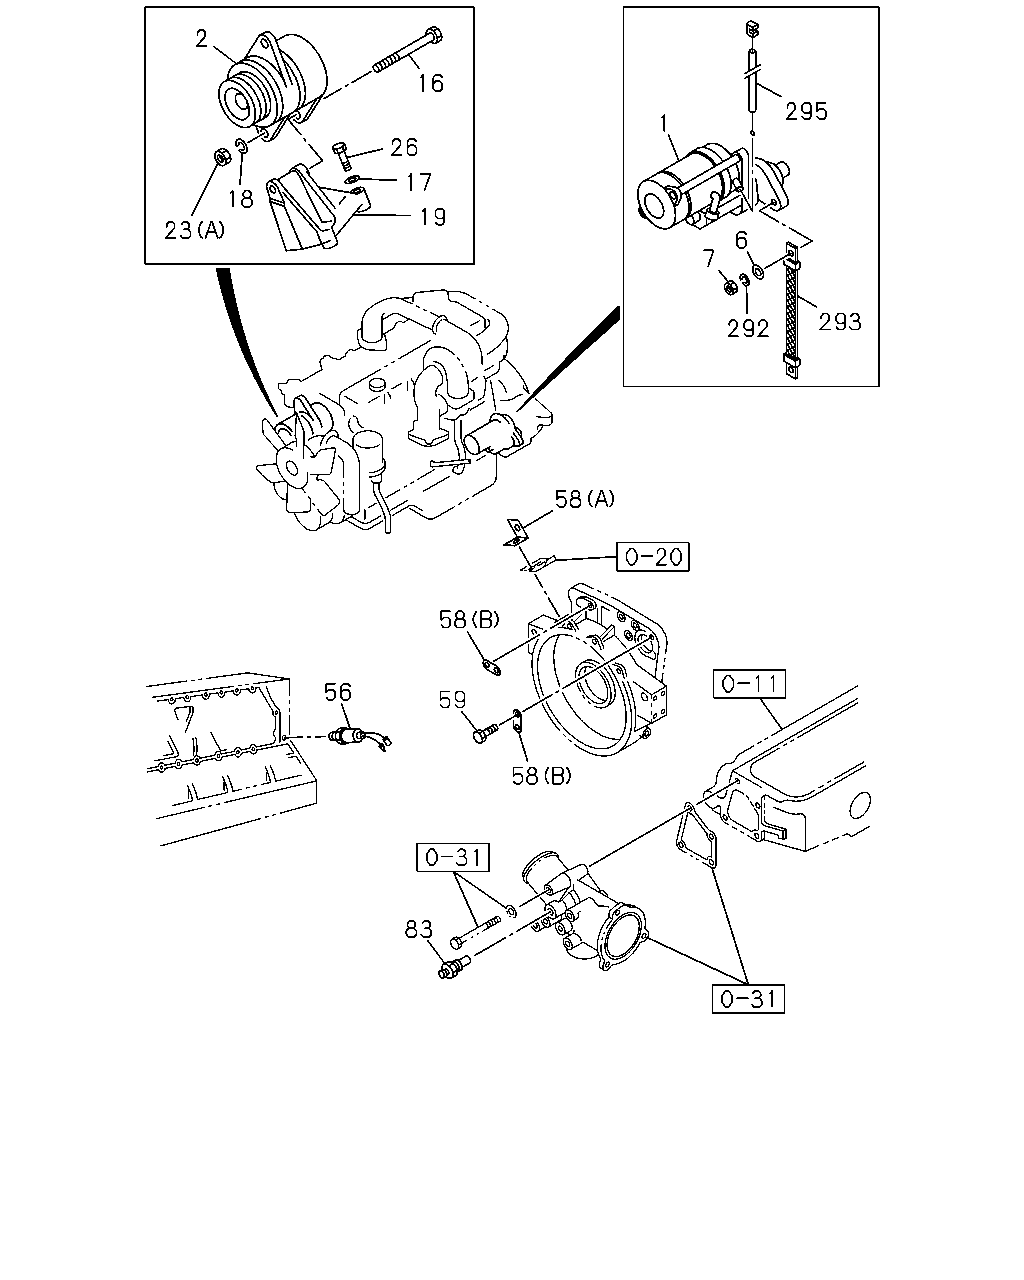 F G 10630 Fvr Rhd 92 95 0 Engine Emission Engine Electrical 0 60 Engine Electrical Control Parts Catcar Info